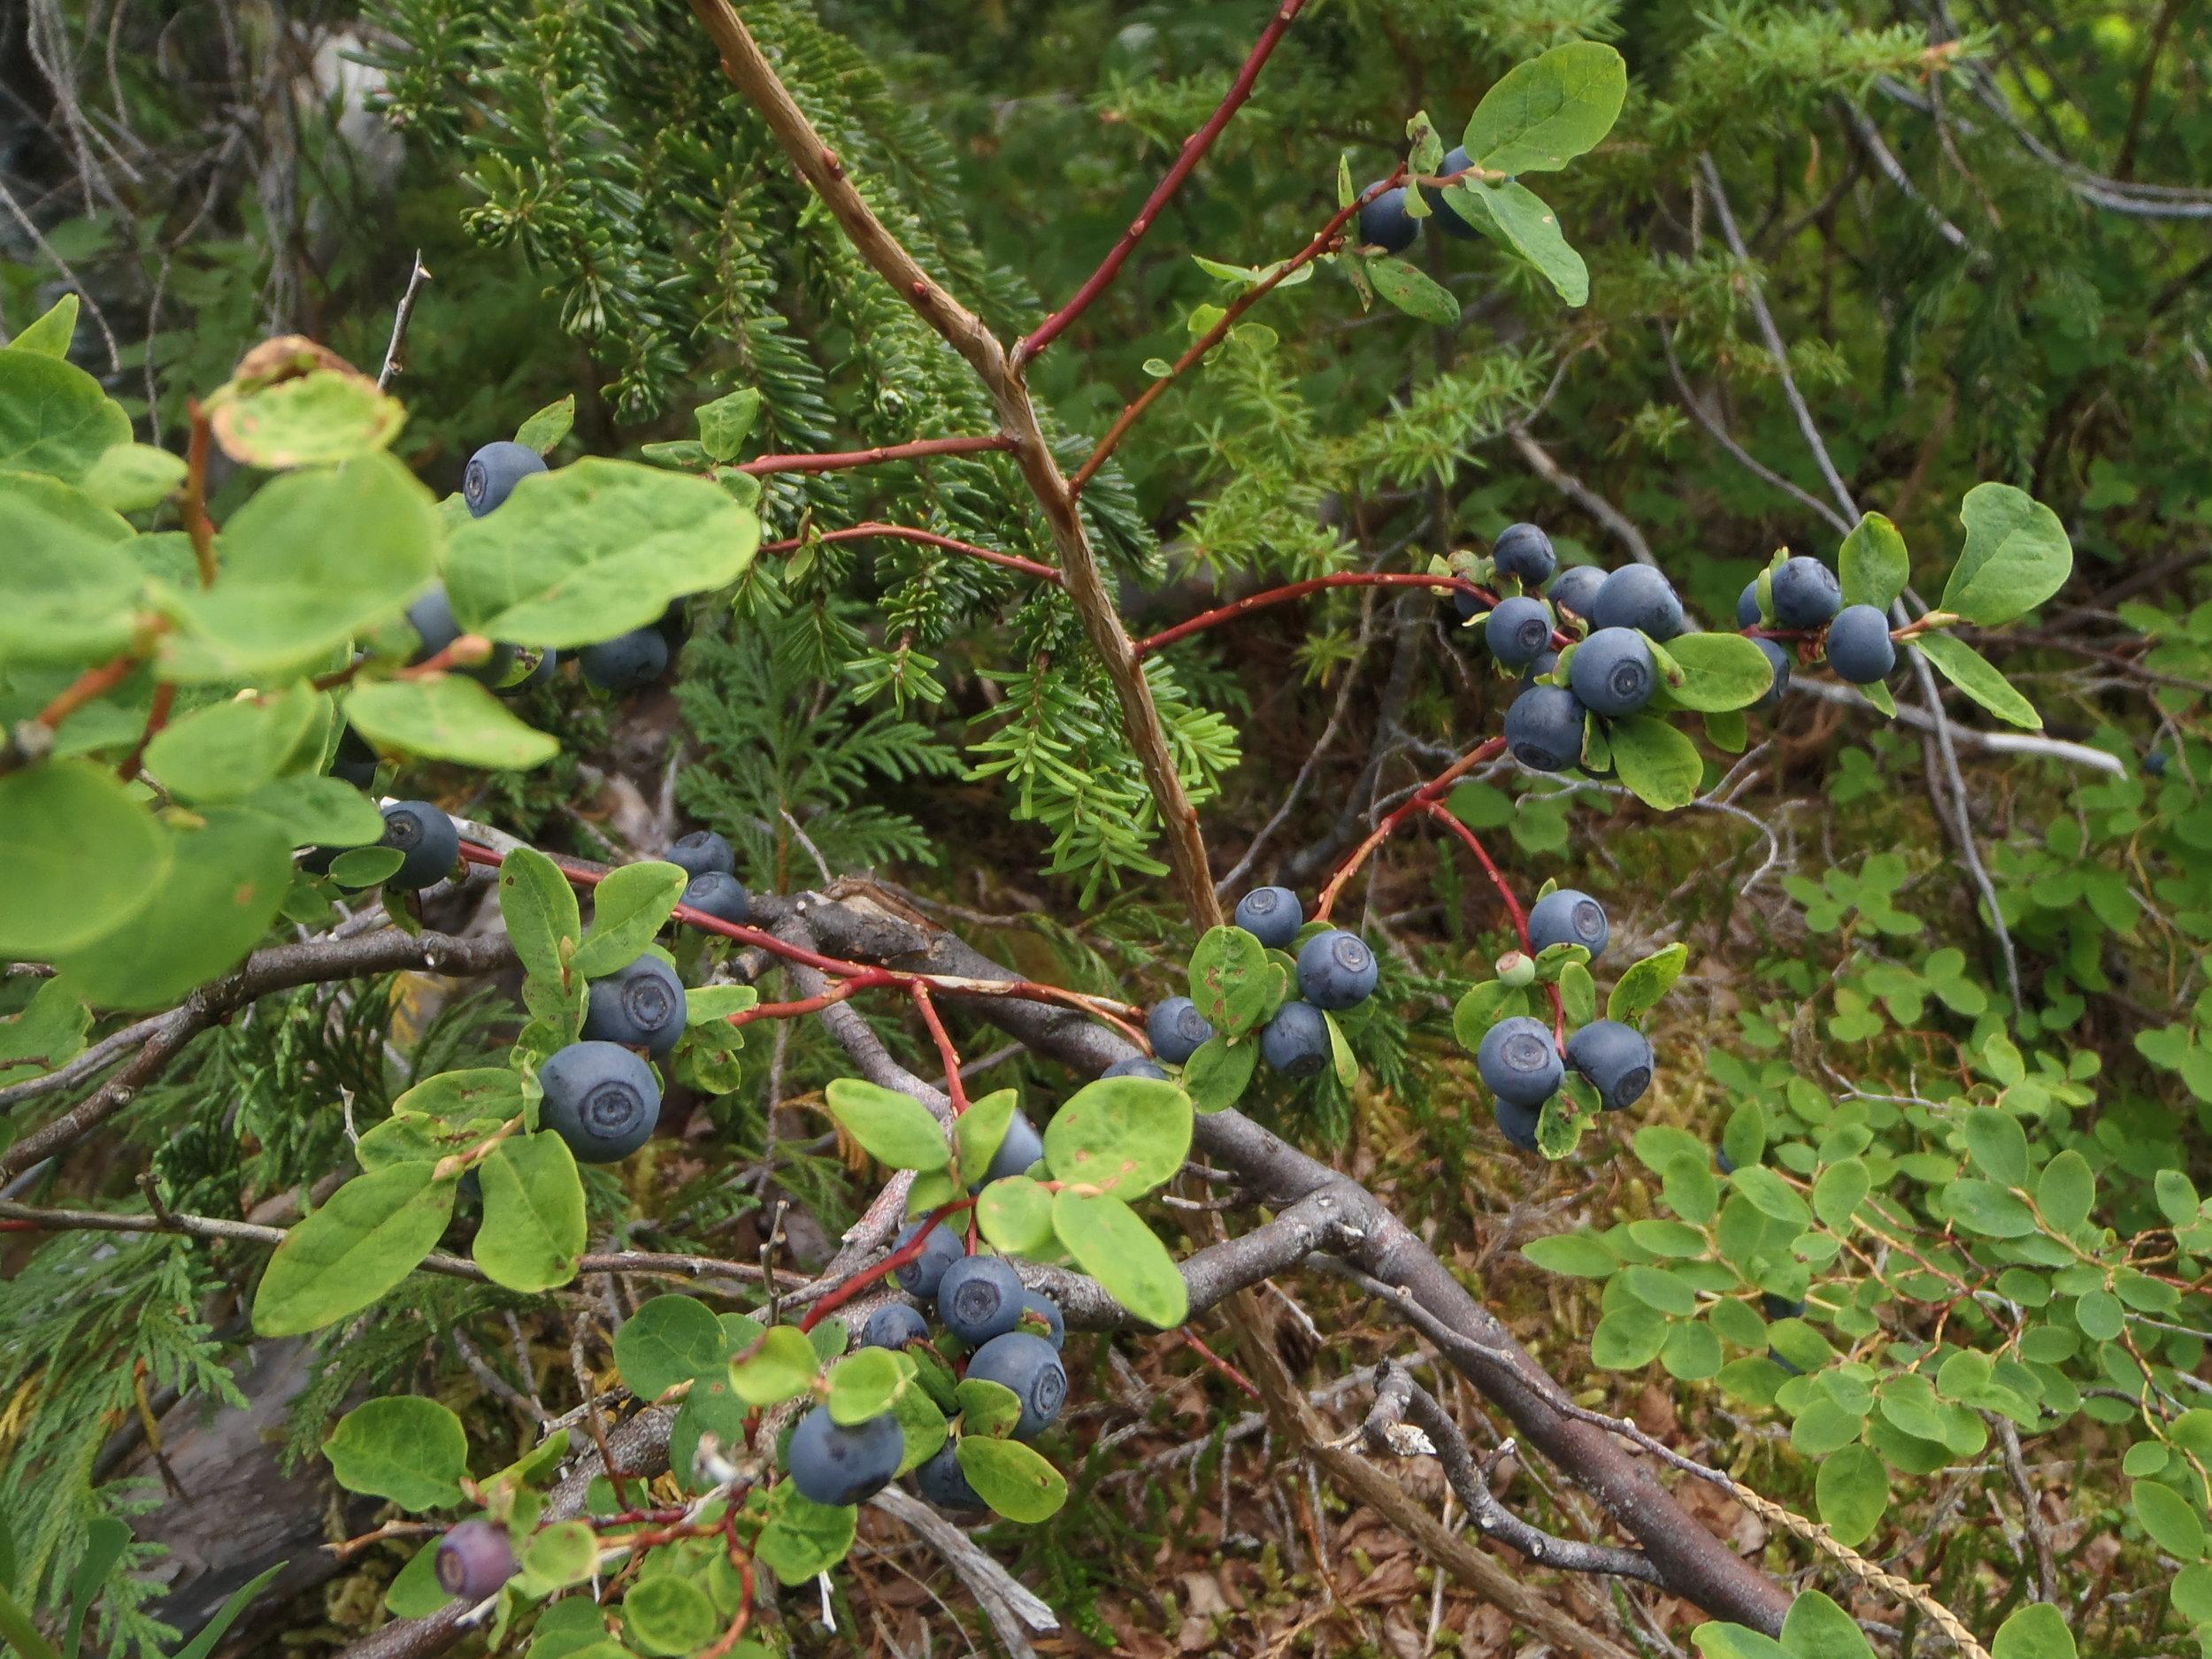 Edible berries during an adventure in the Rockies